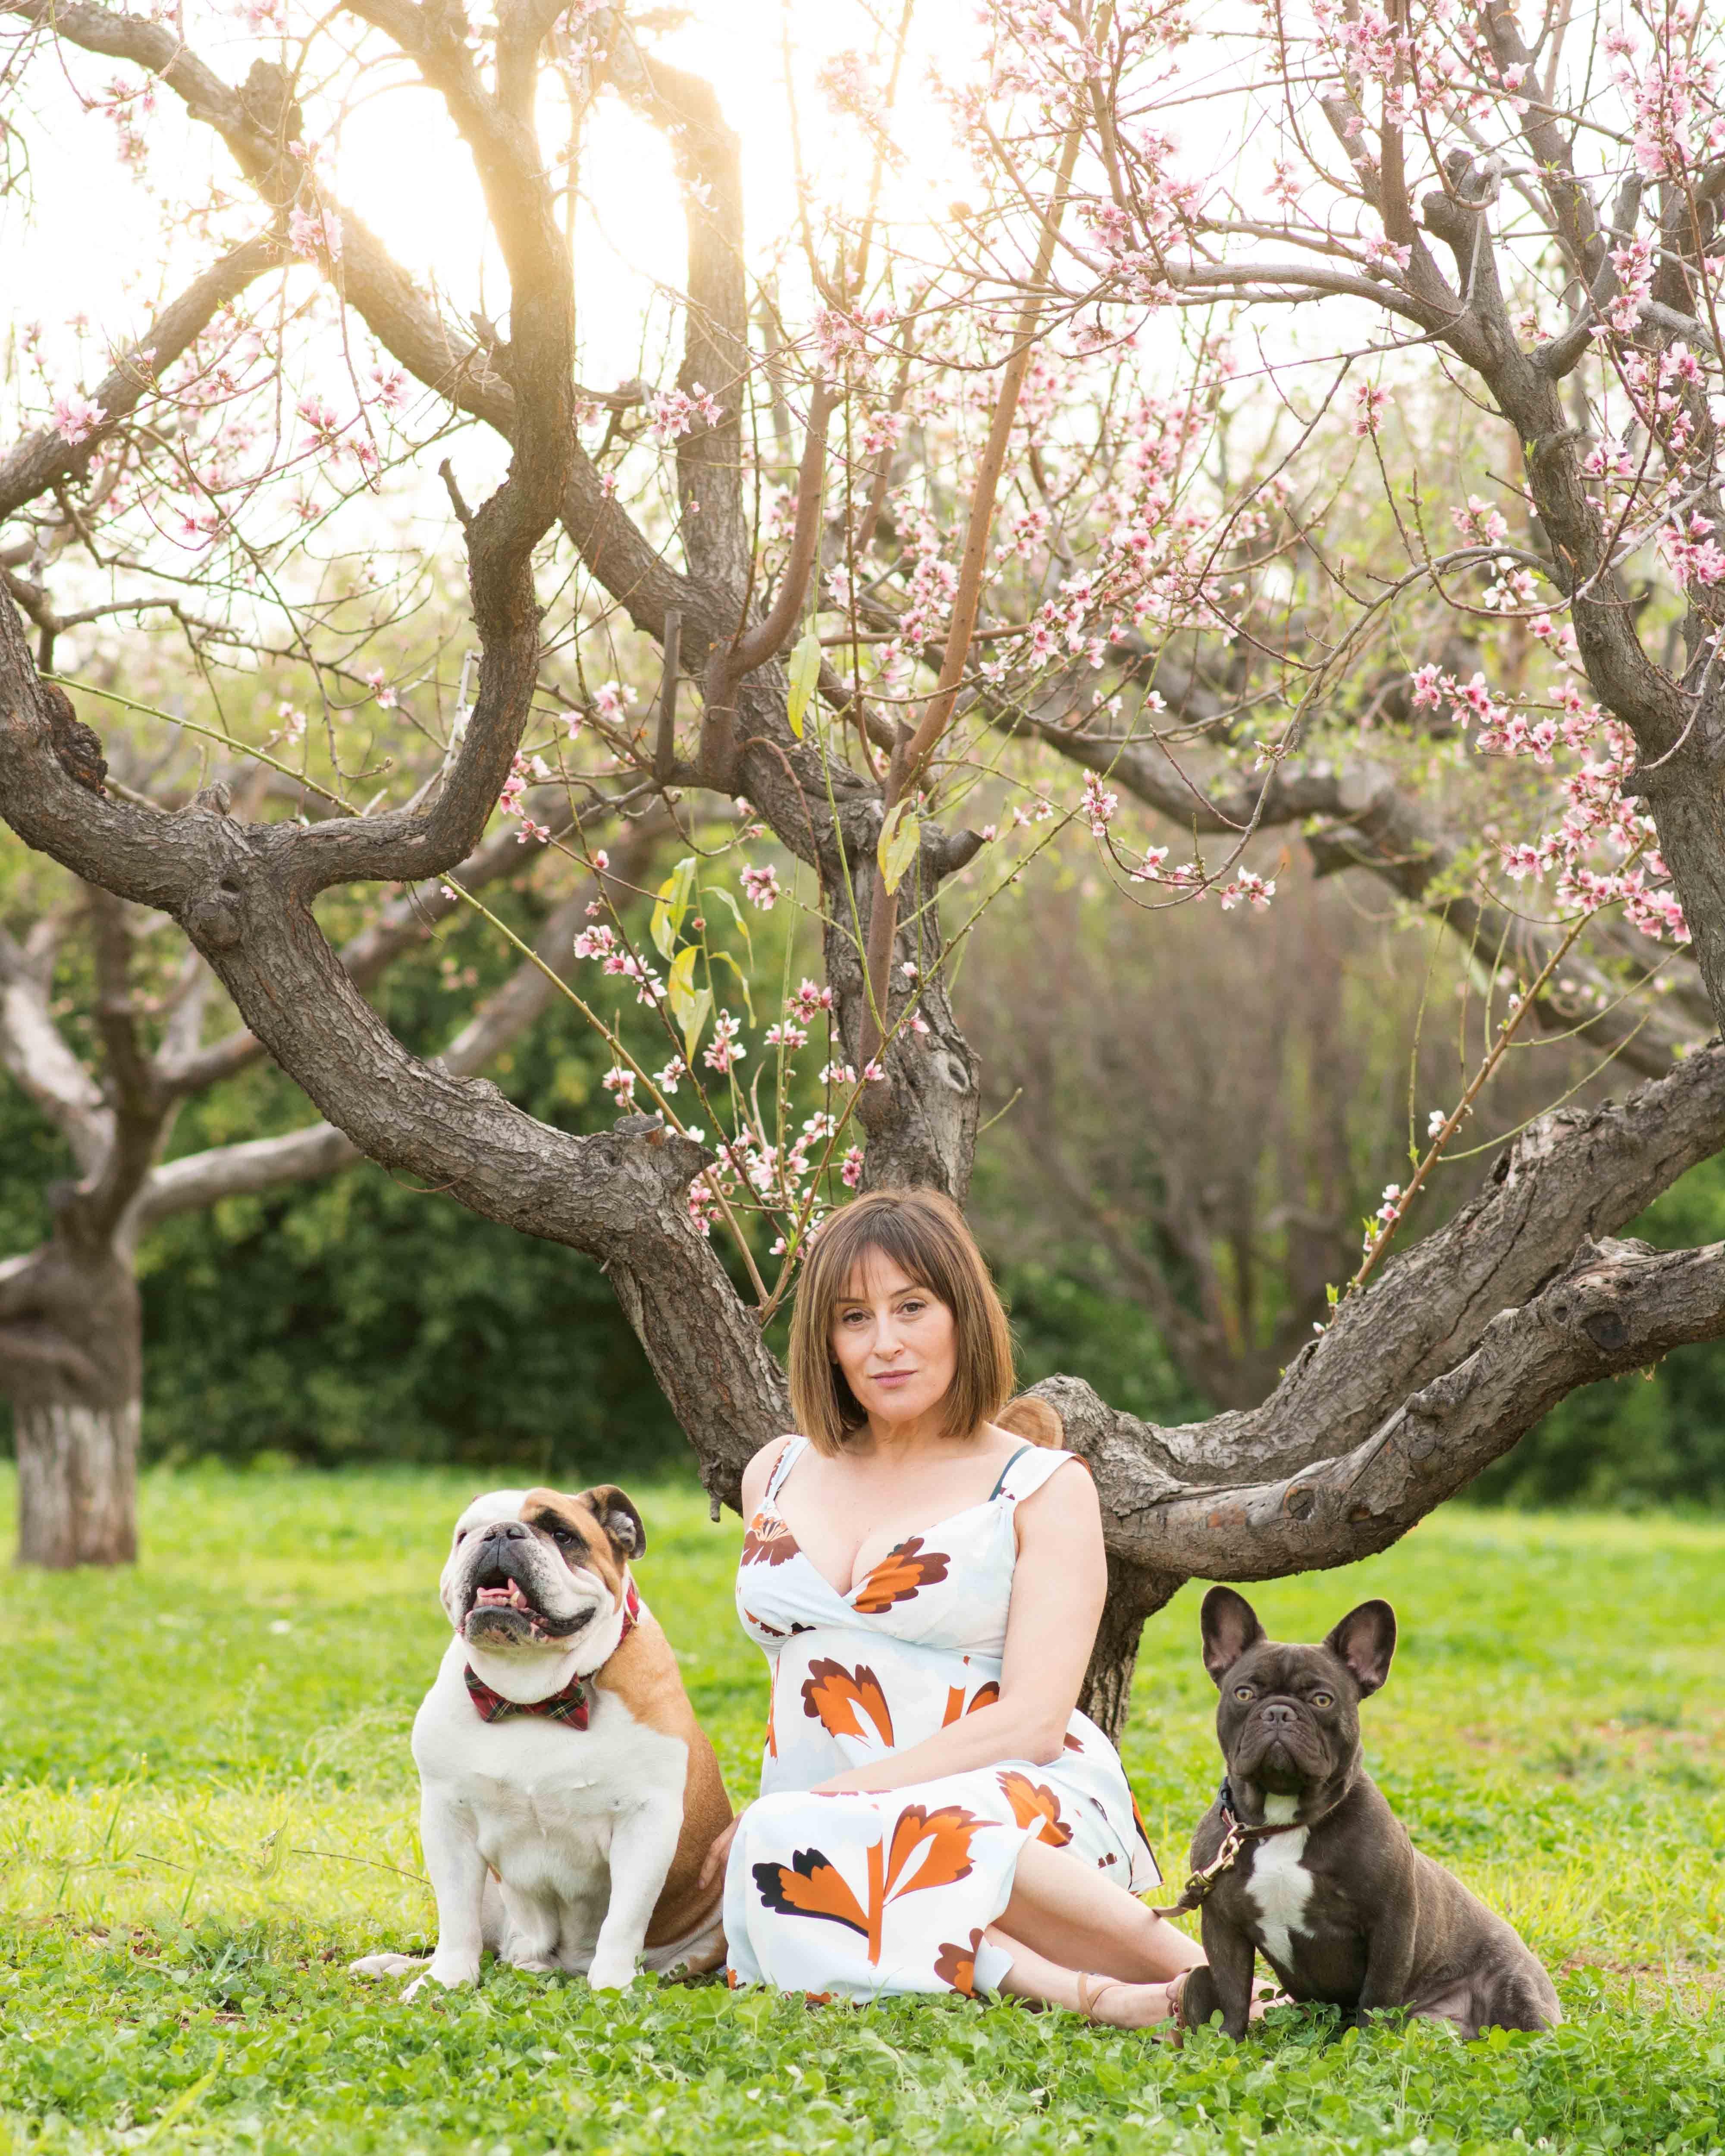 Woman And Two Bulldogs By Peach Blossom Tree In Agritopia Farm In Gilbert Az Peach Blossom Tree Peach Blossoms Pet Portraits